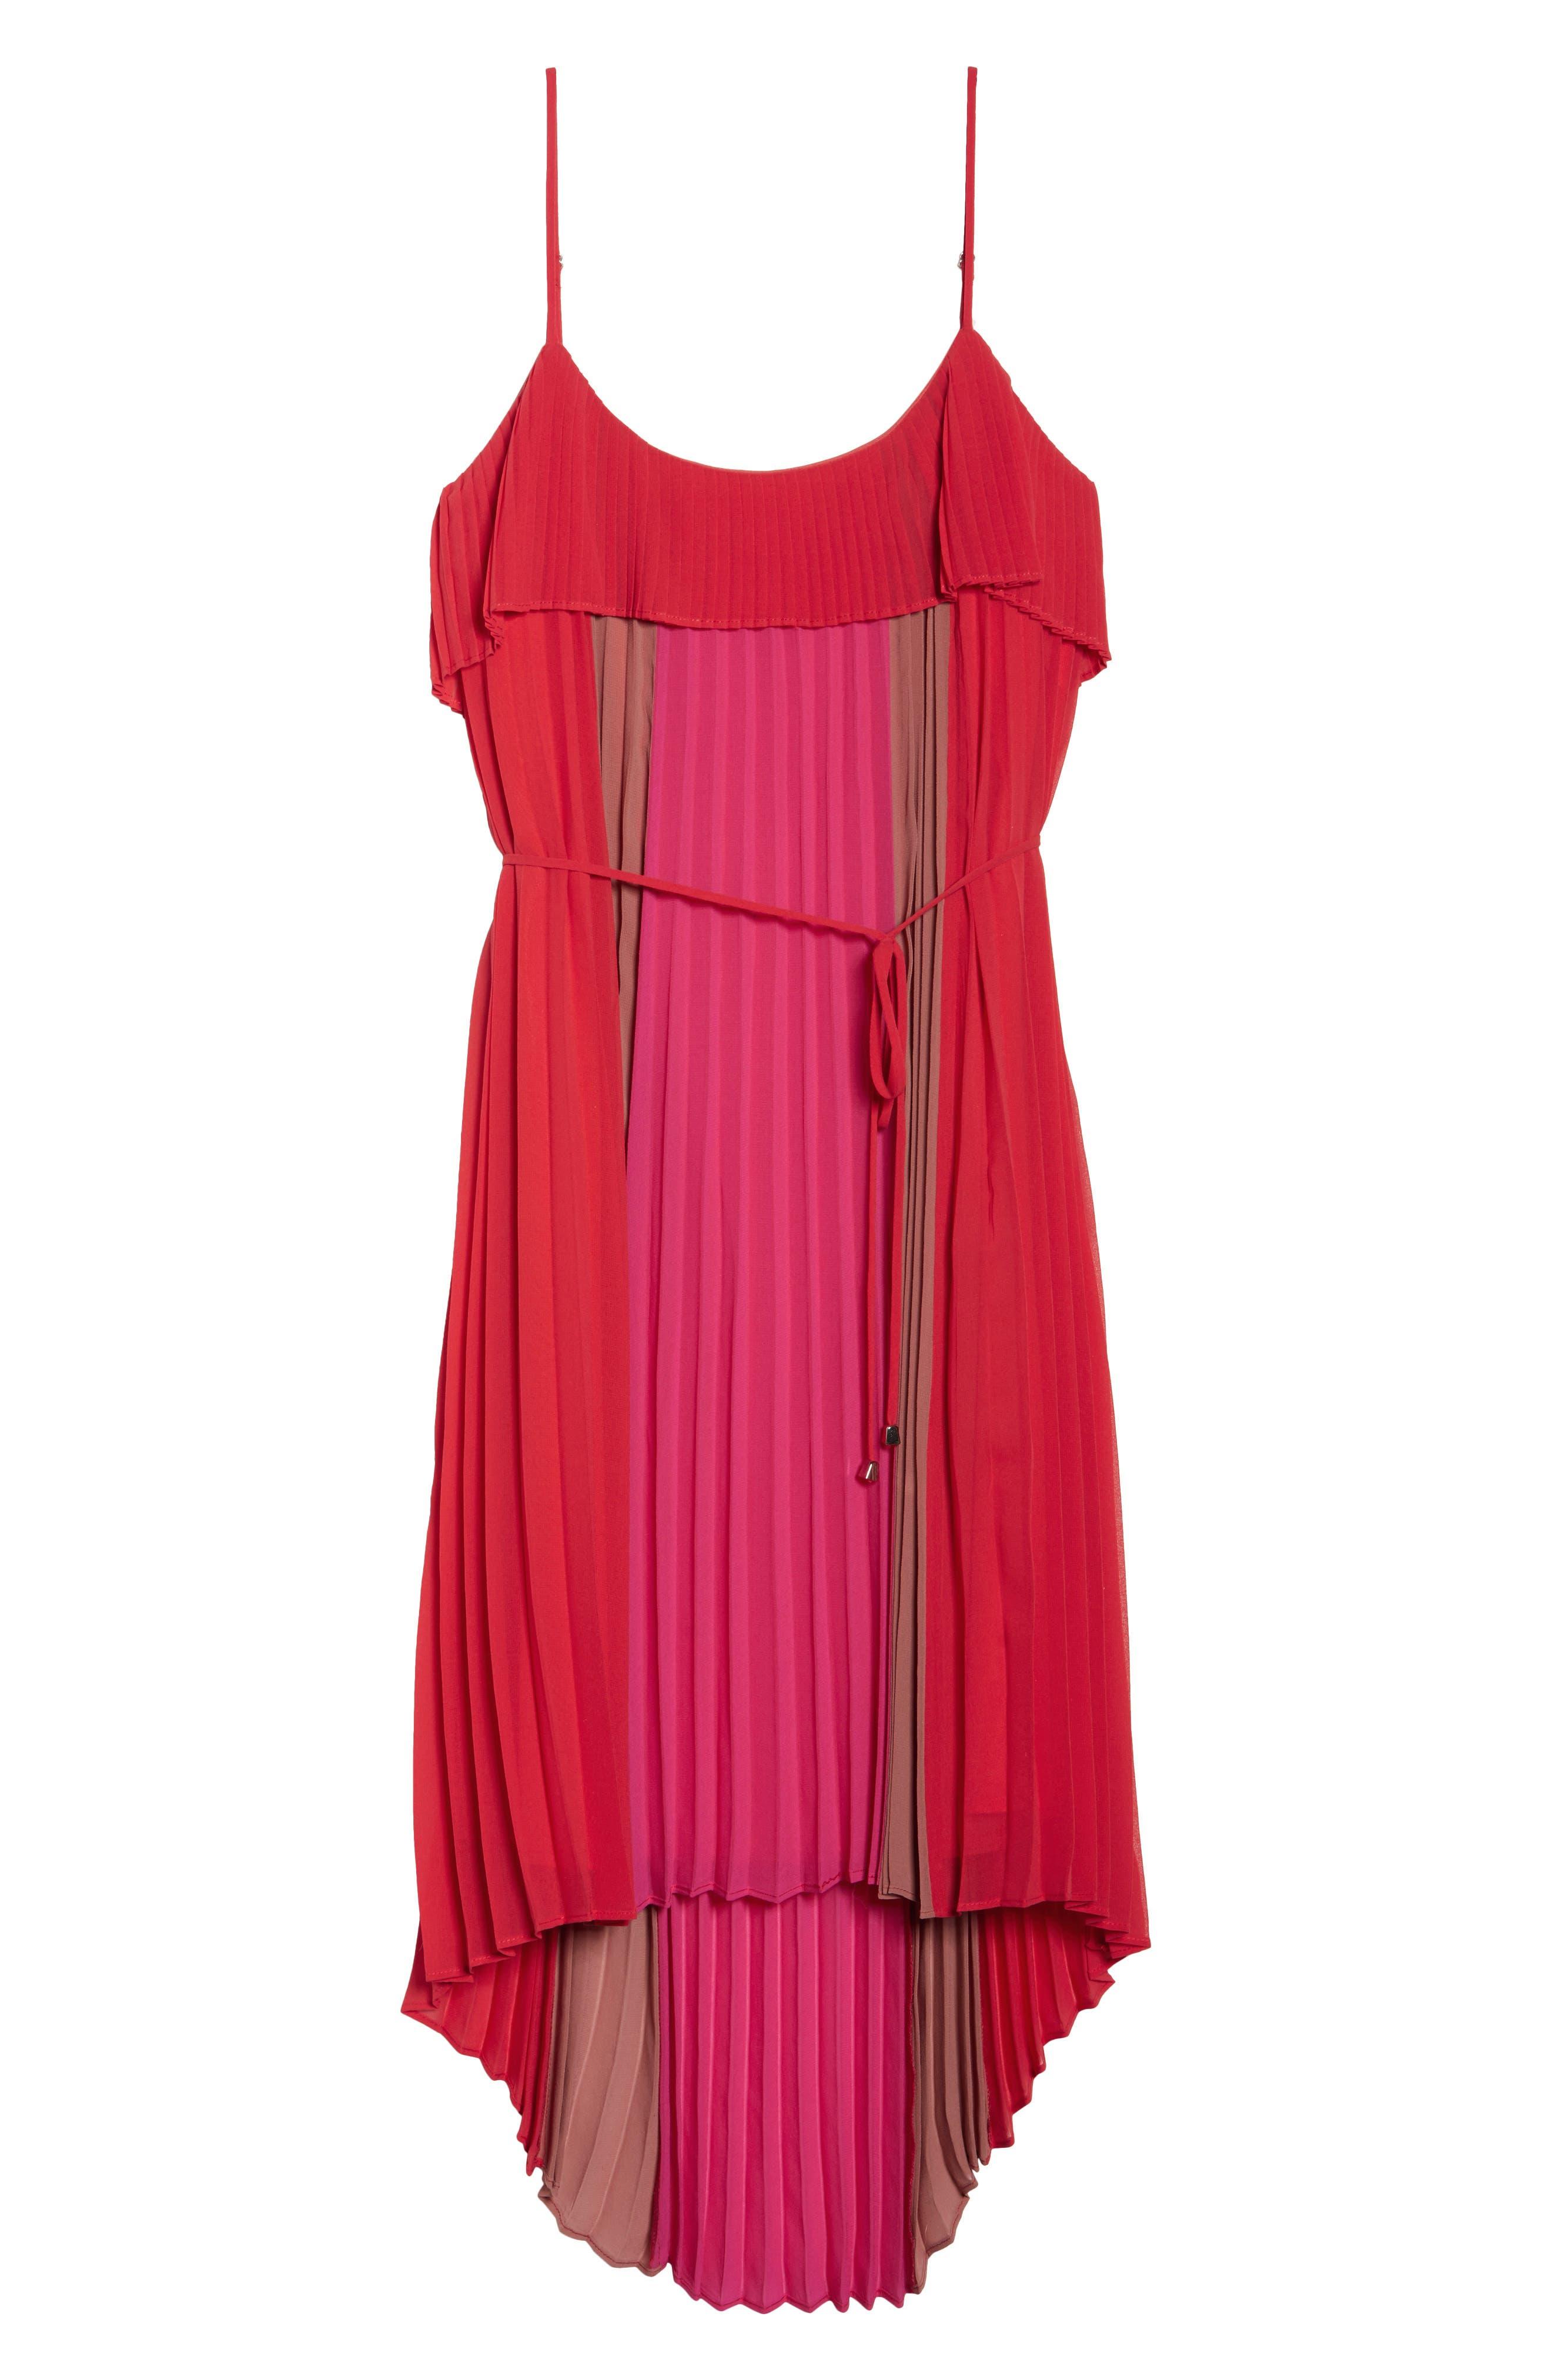 Pepper Pleated Dress,                             Alternate thumbnail 7, color,                             600